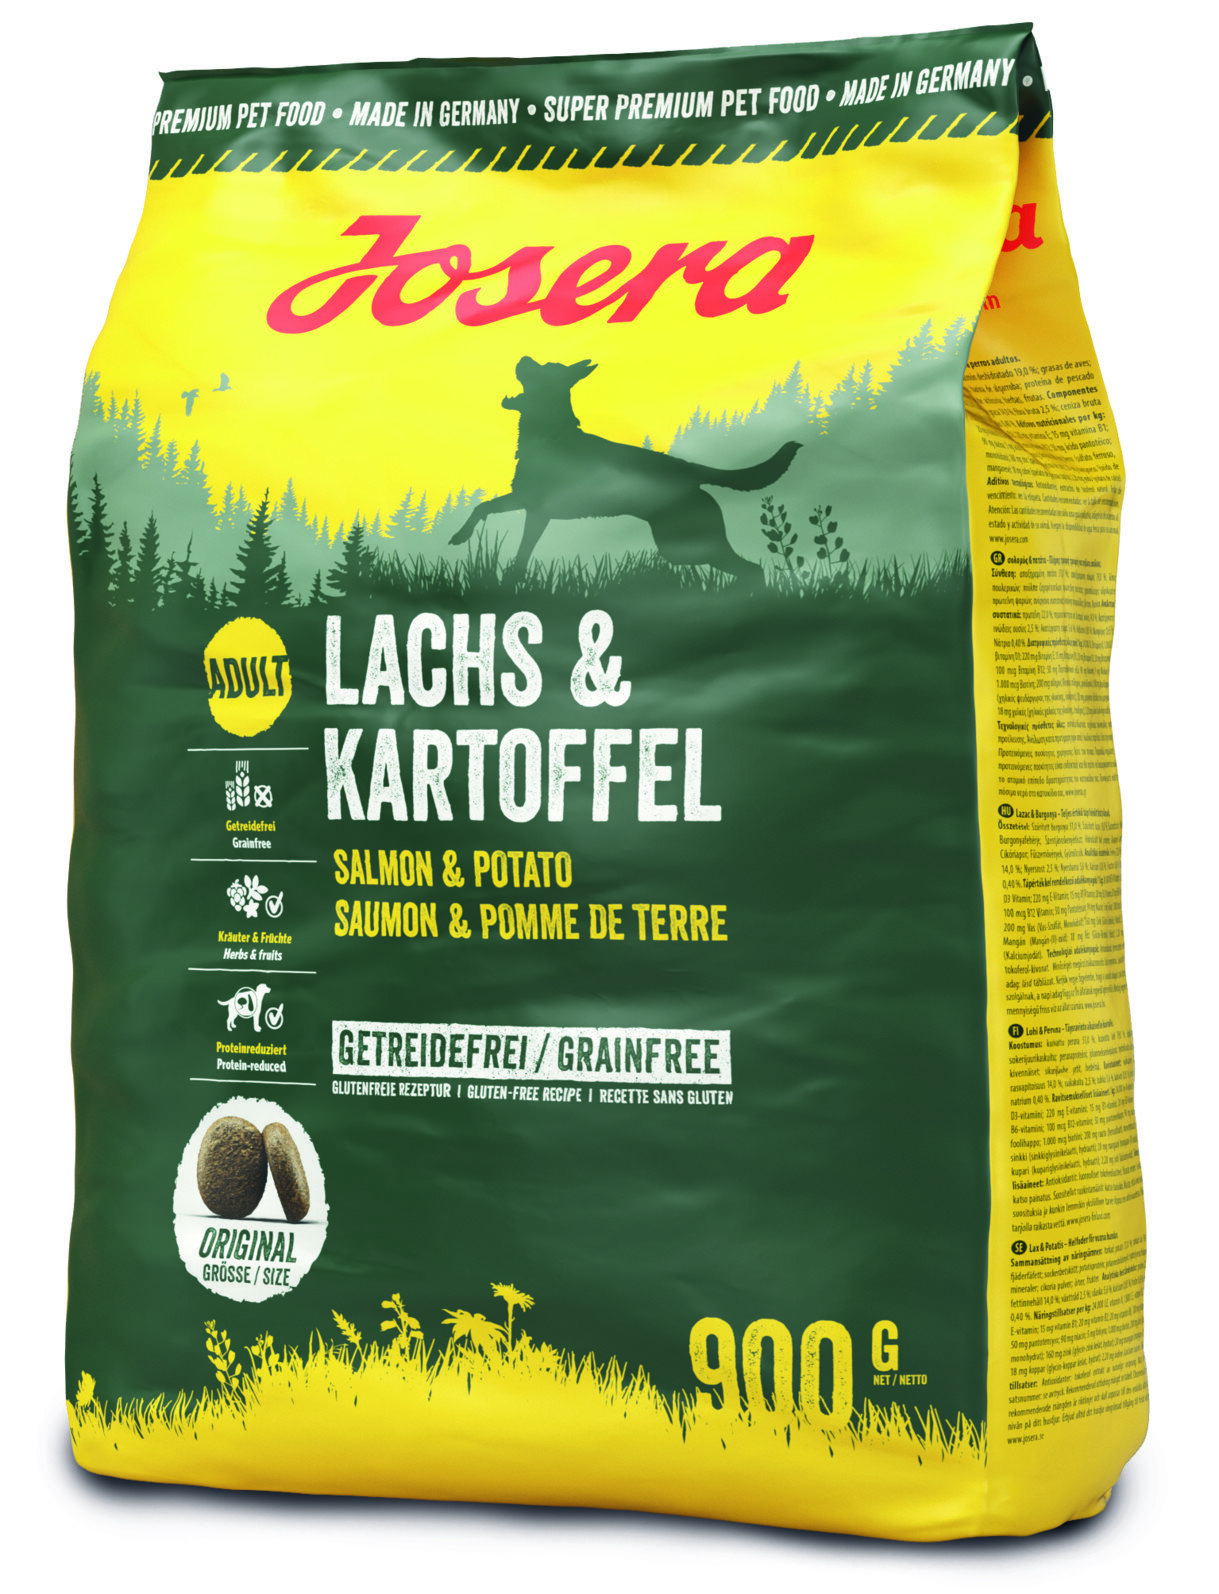 JOSERA DOG LACHS & KARTOFFEL